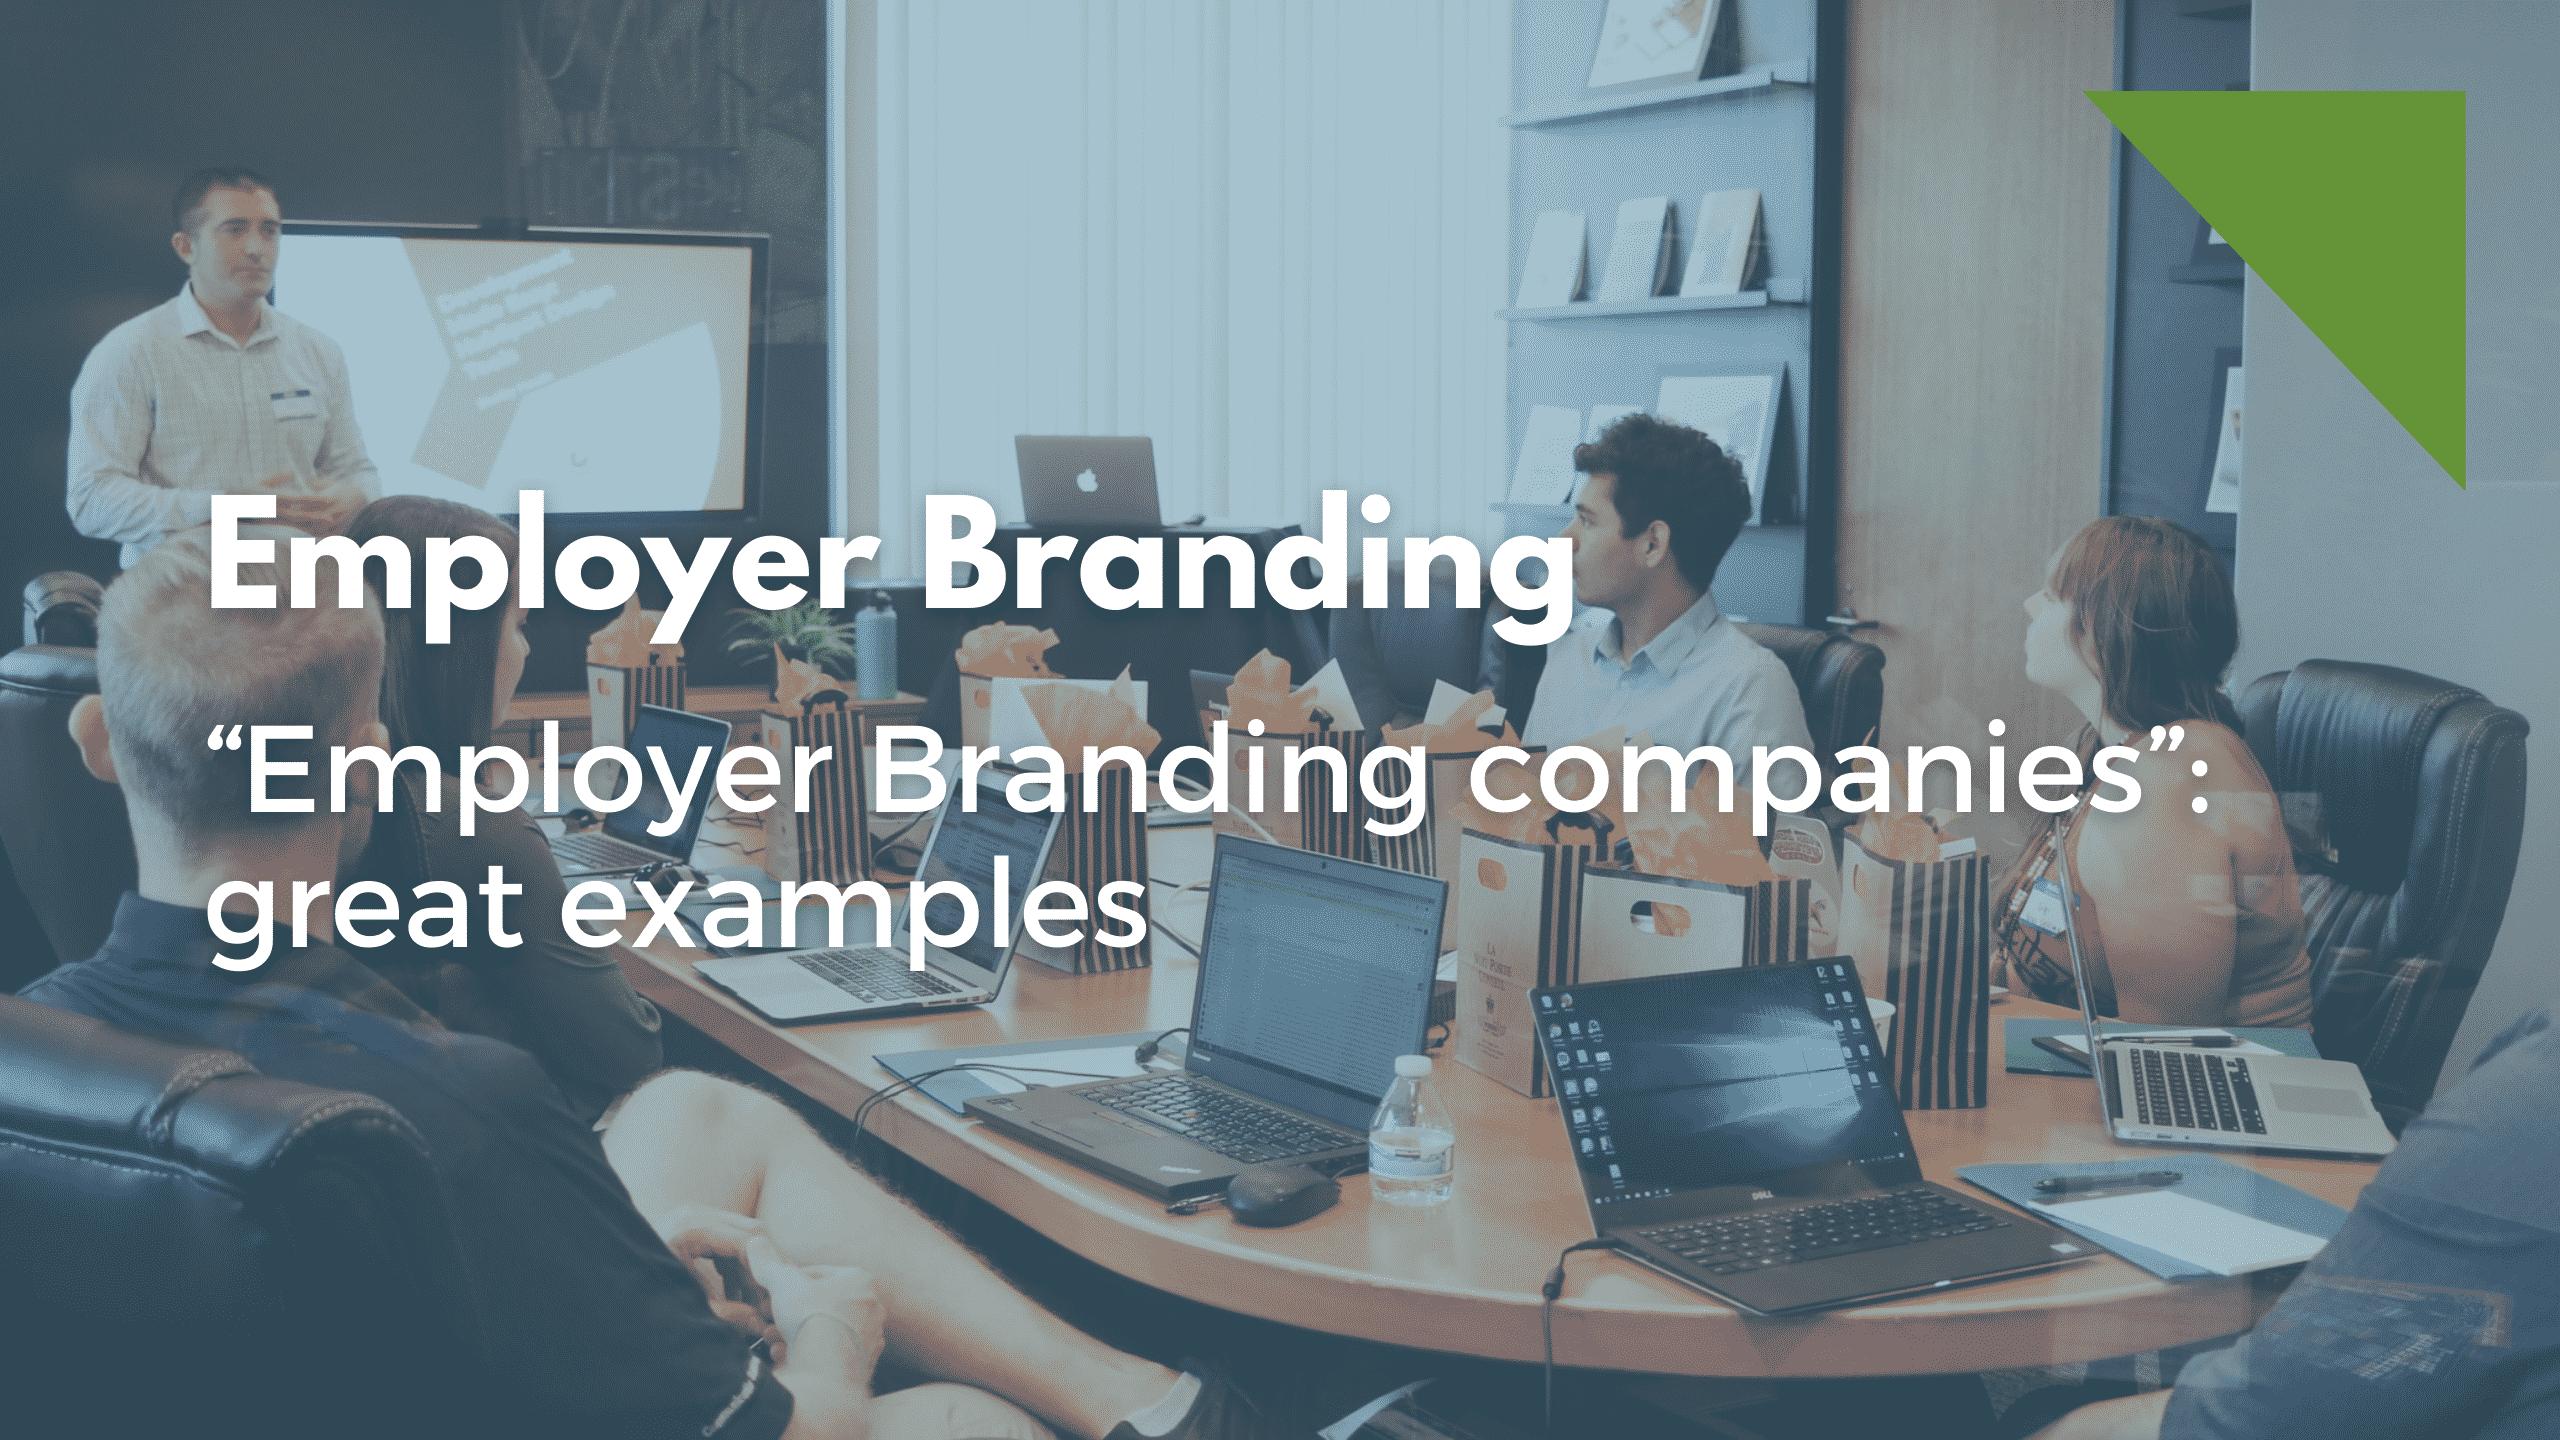 Companies Employer Branding